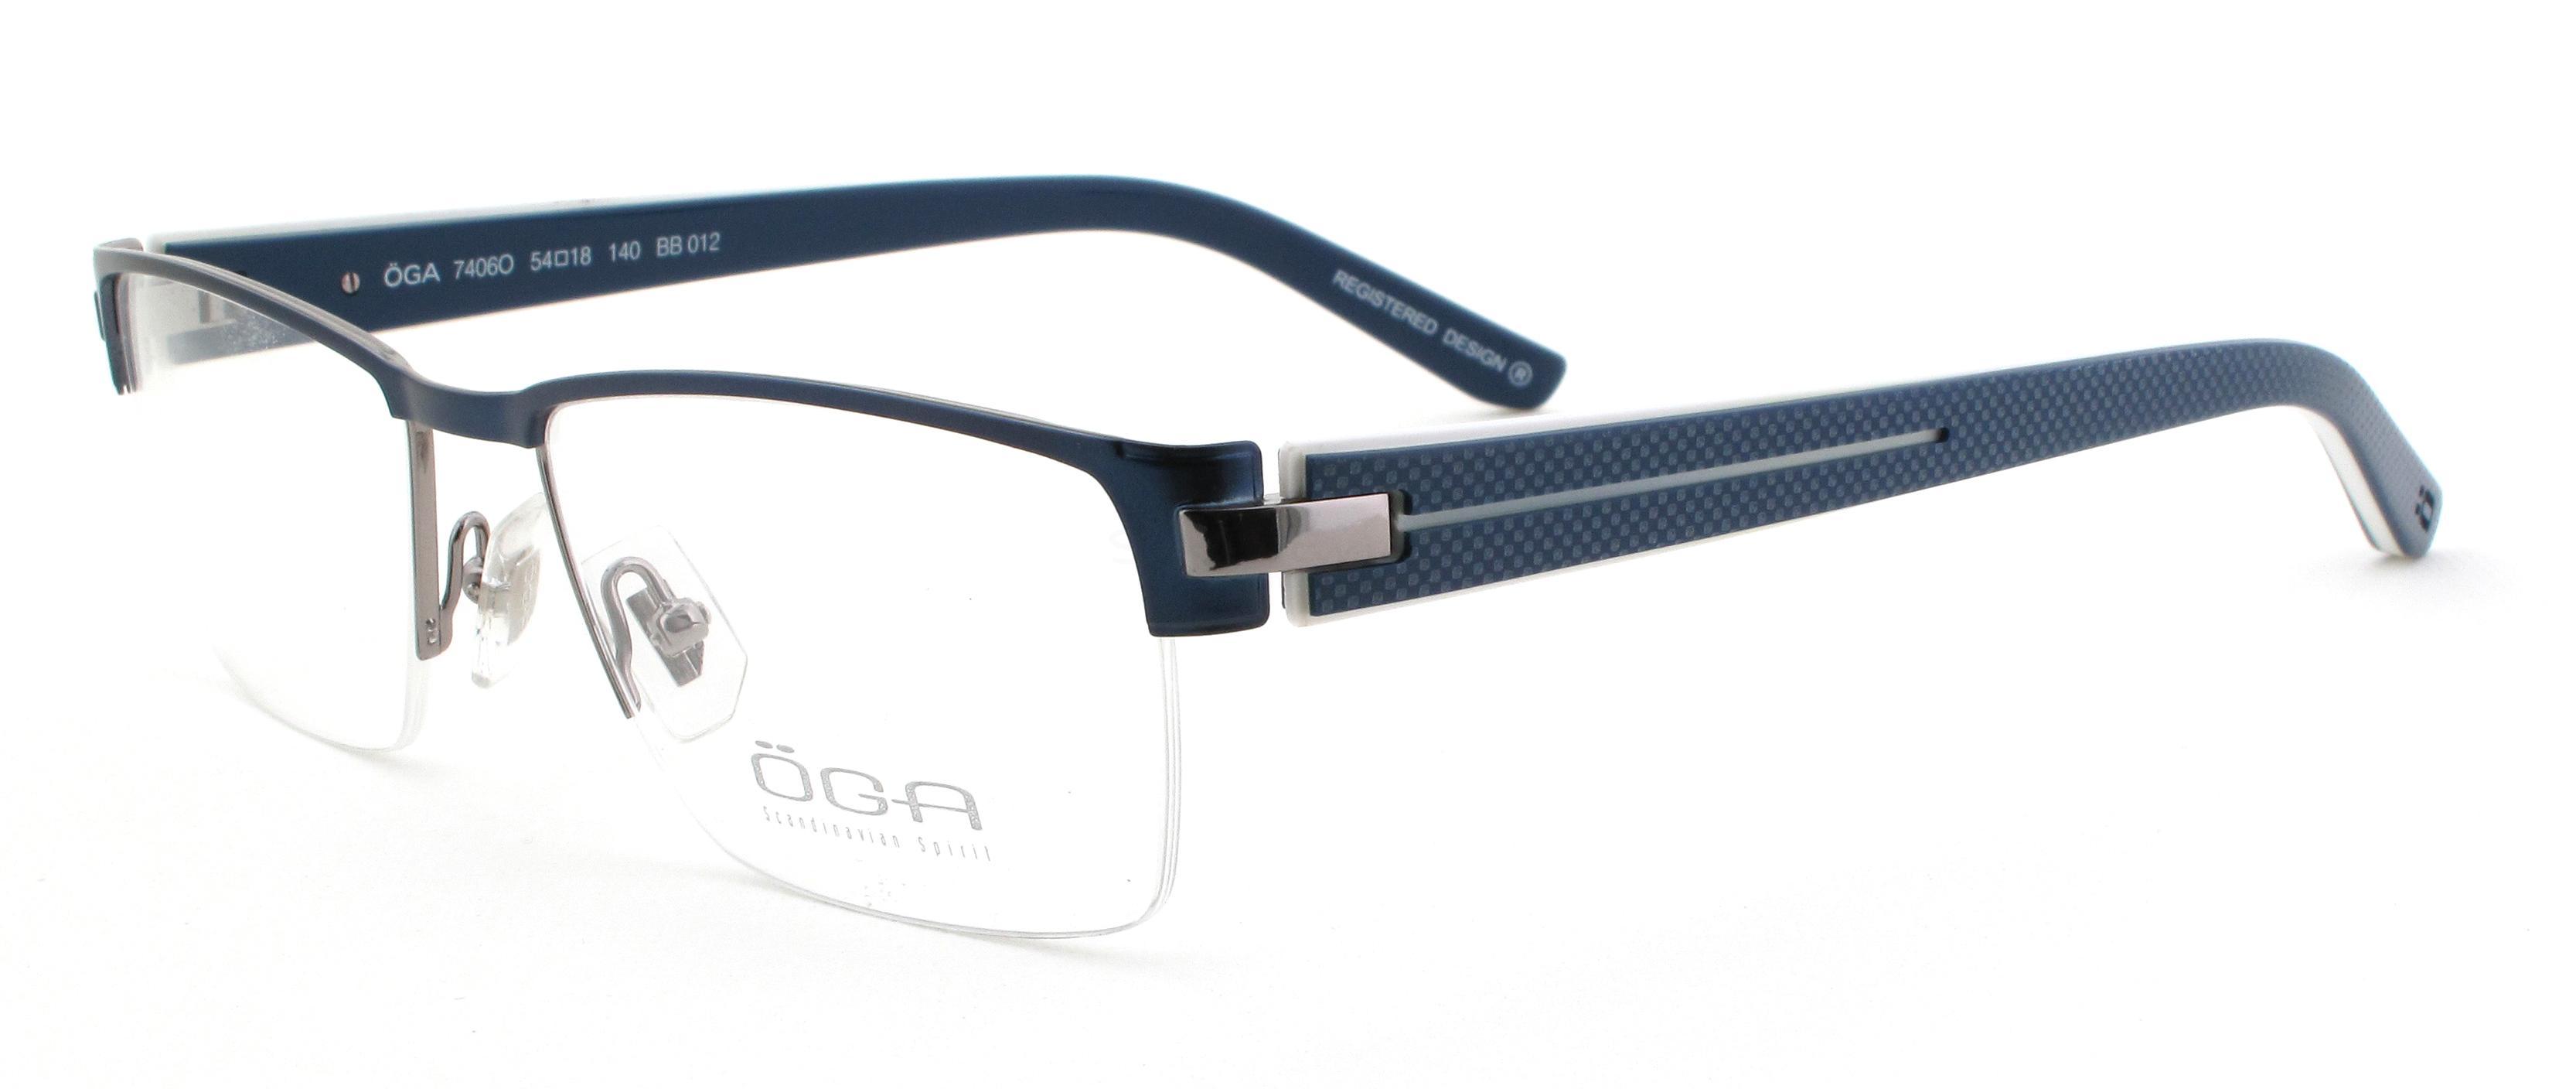 BB012 7406O TALVAC 1 Glasses, ÖGA Scandinavian Spirit